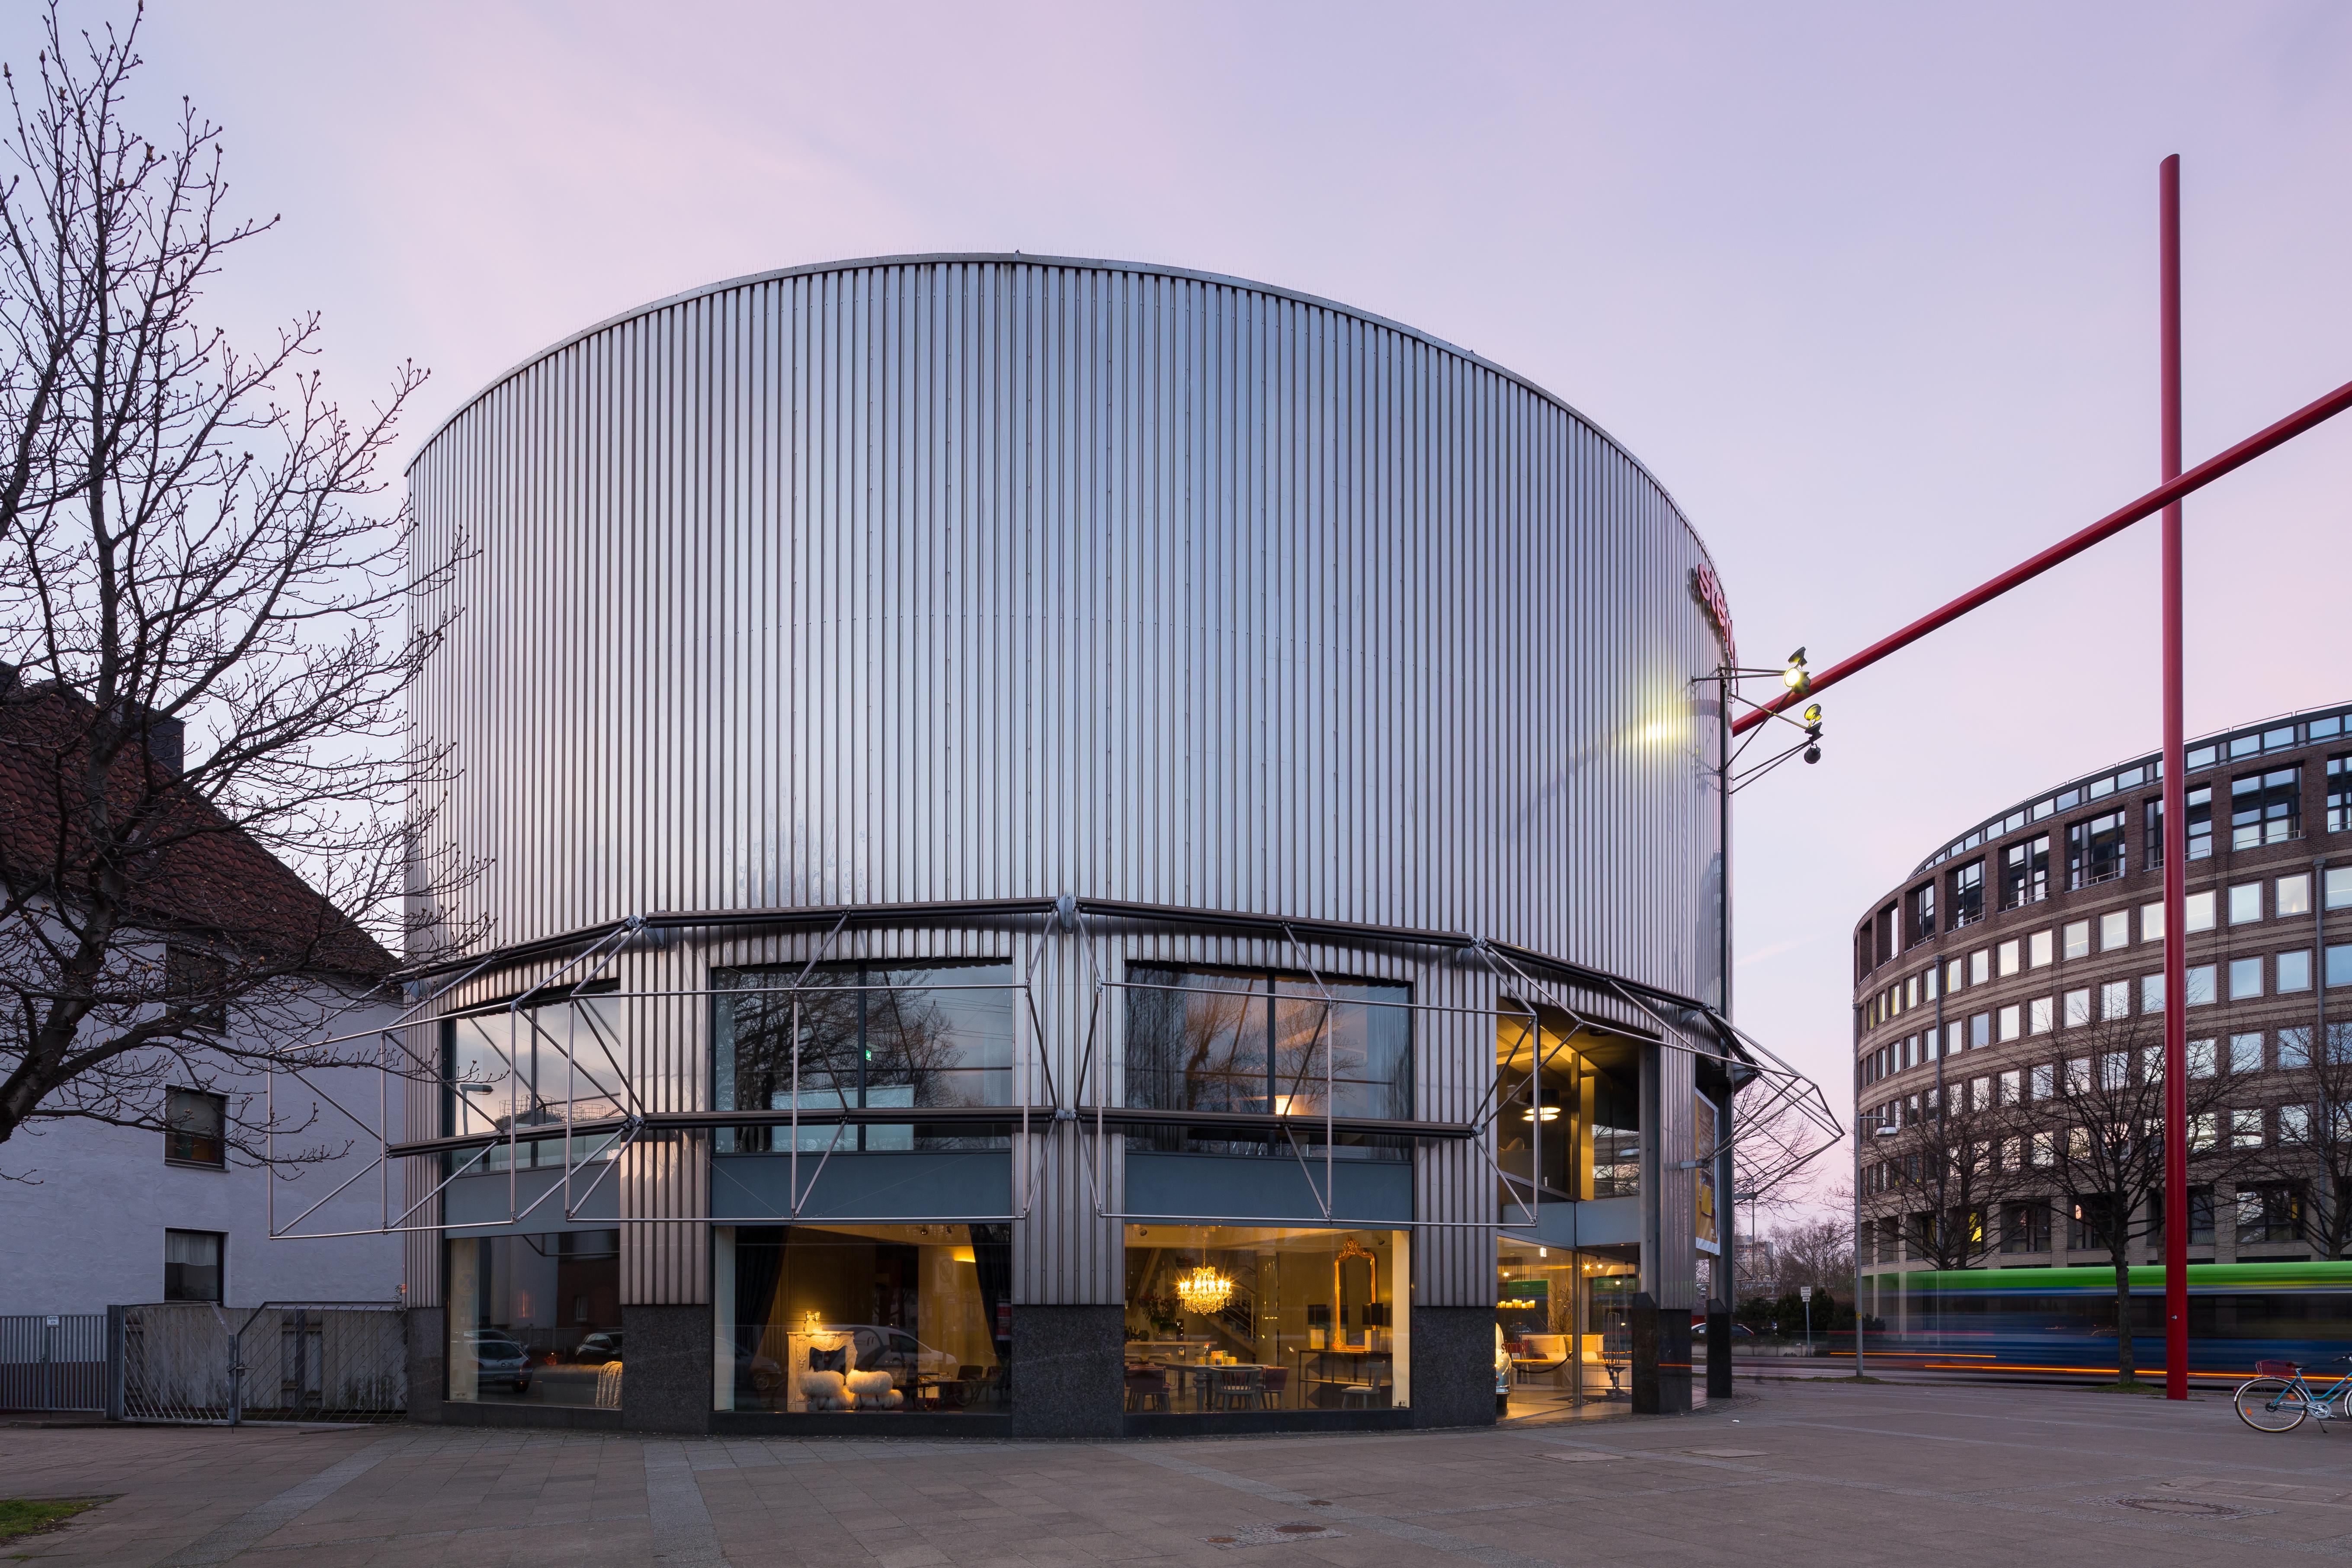 Furniture store building - File Furniture Store Building Steinhoff Braunschweiger Platz Bult Hannover Germany Jpg